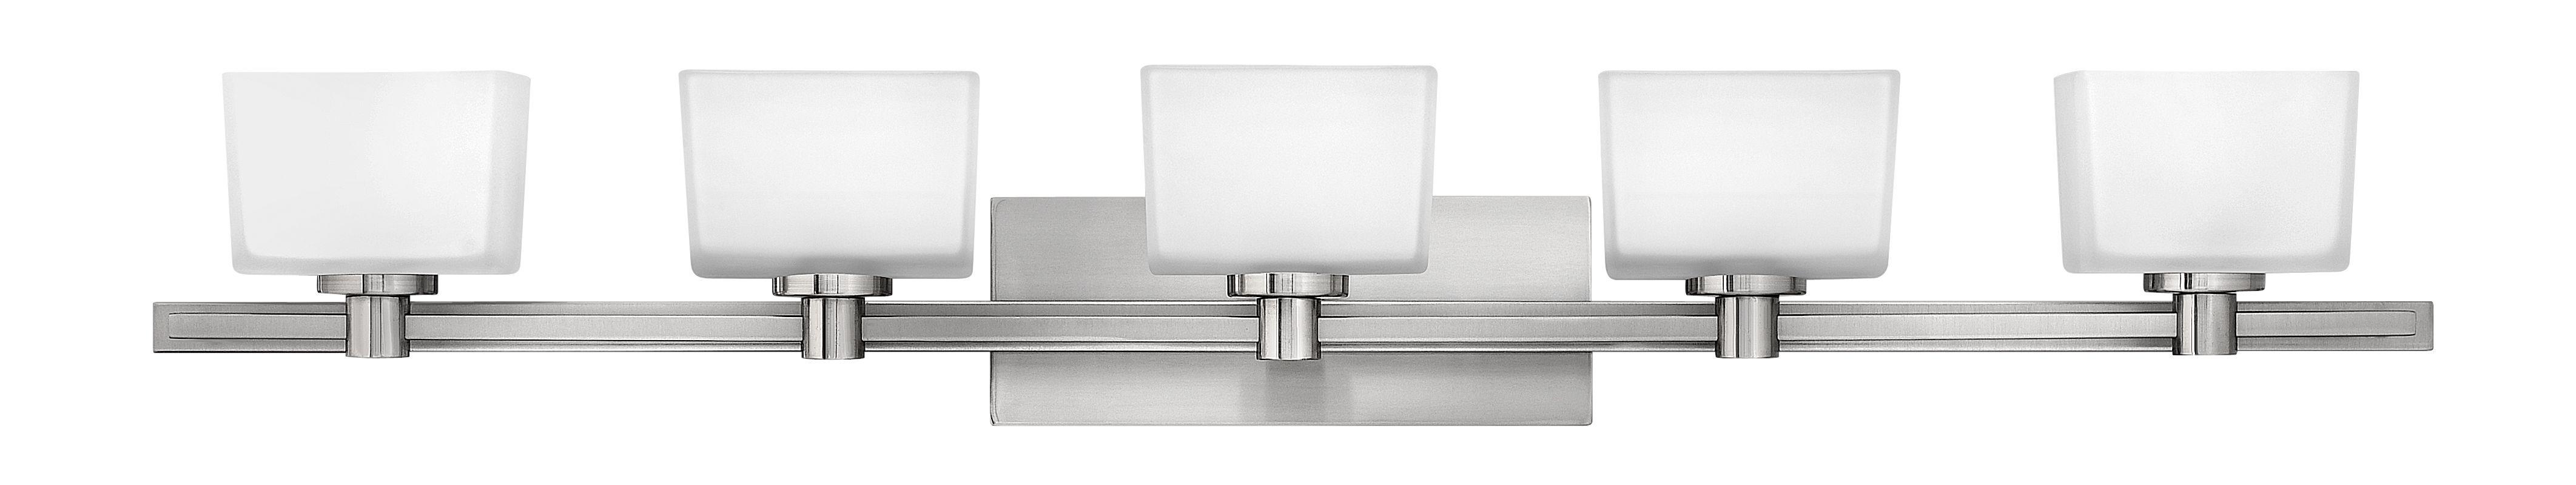 Hinkley 5025BN Brushed Nickel Contemporary Taylor Bathroom Light